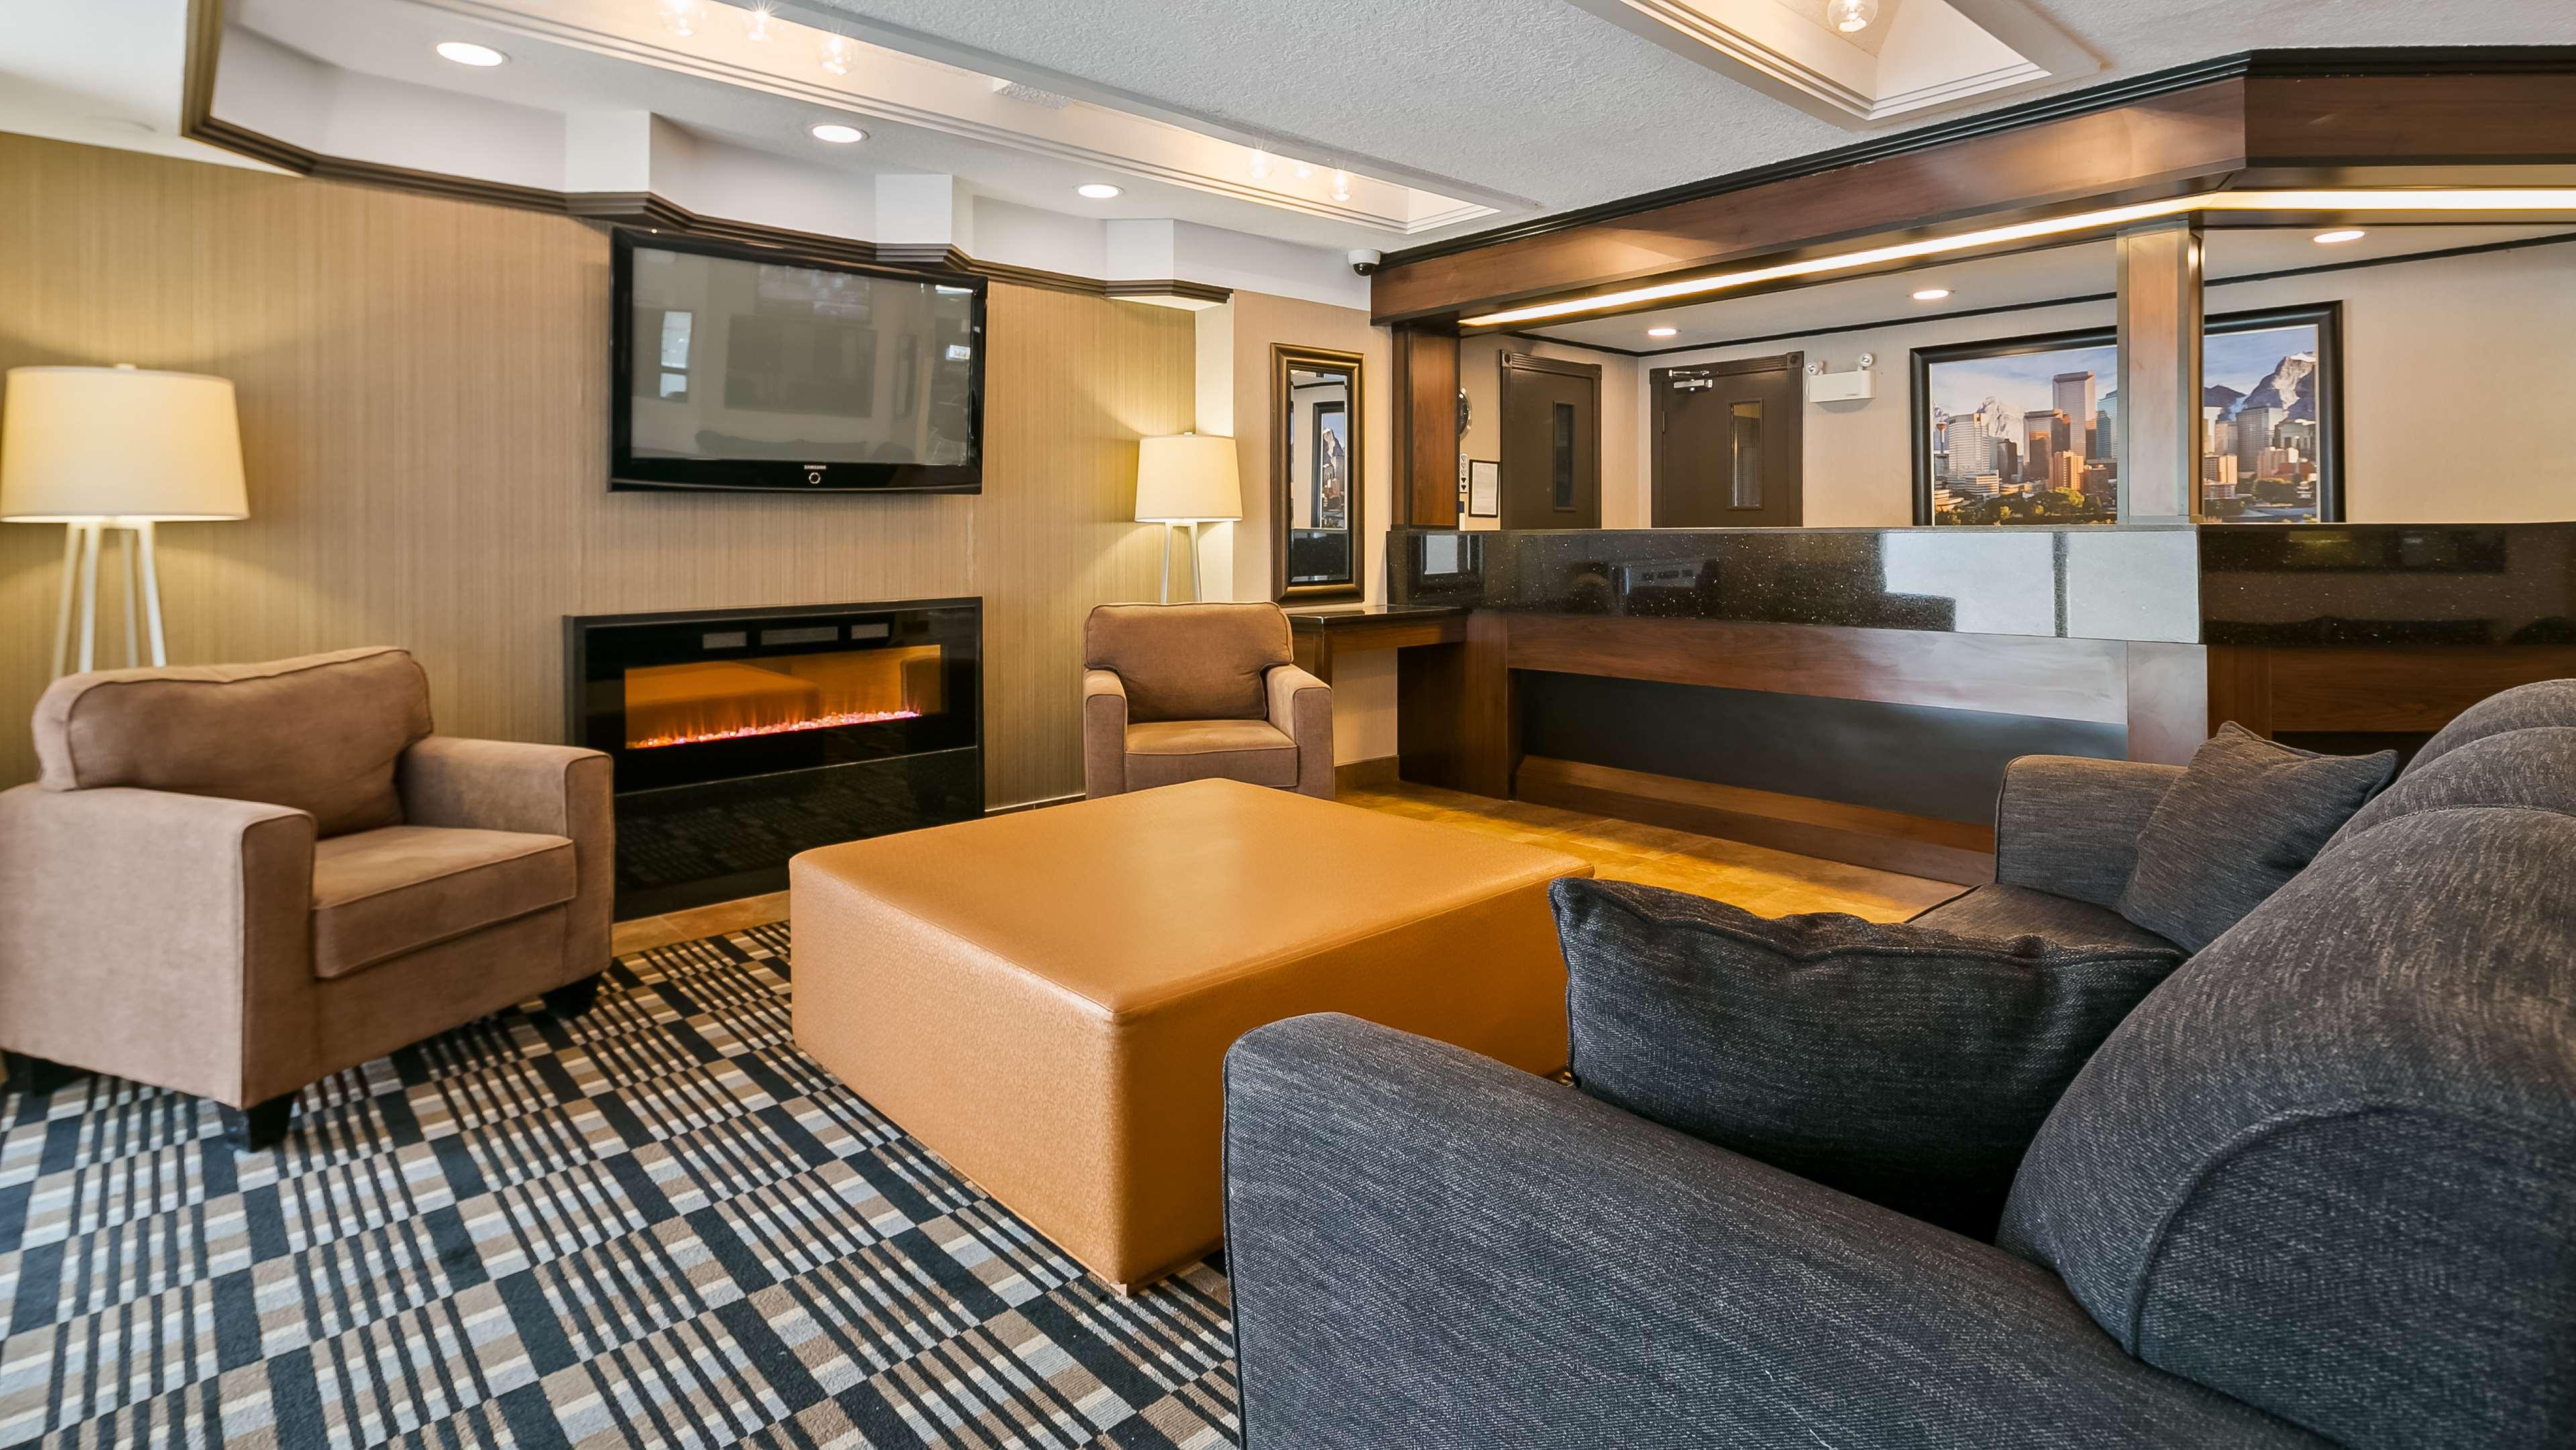 Best Western Airport Inn in Calgary: Hotel Lobby